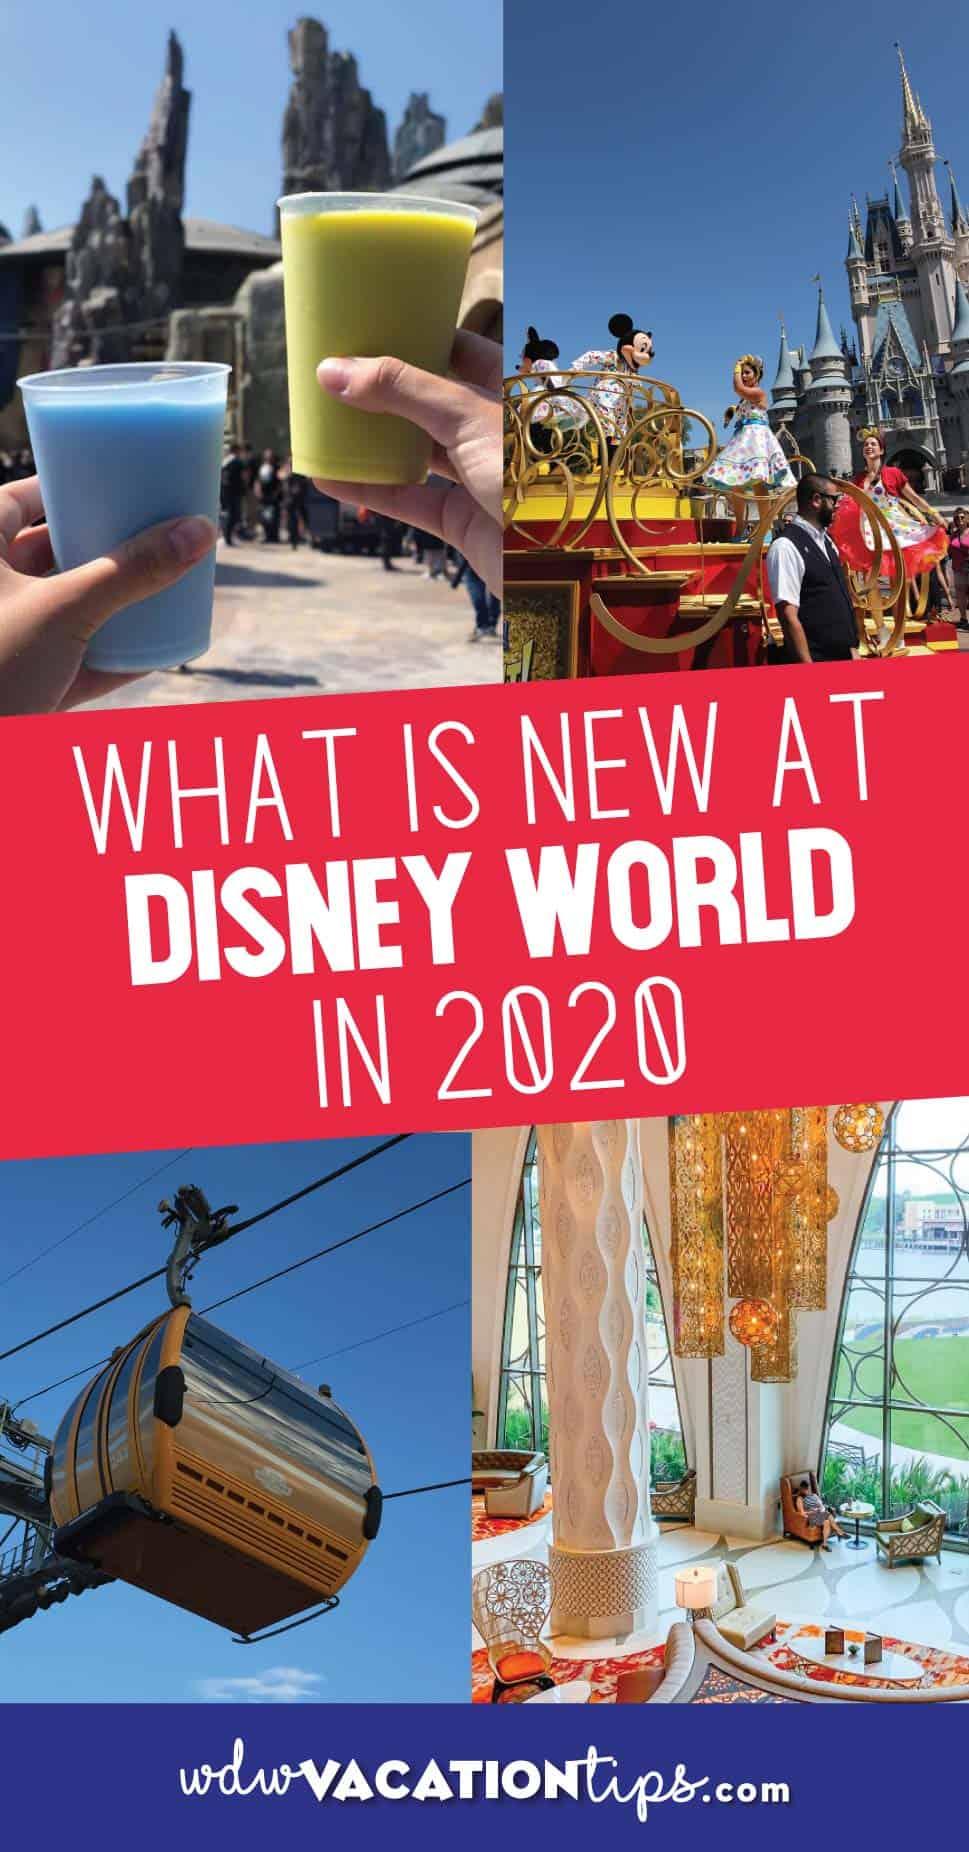 New at Disney World 2020